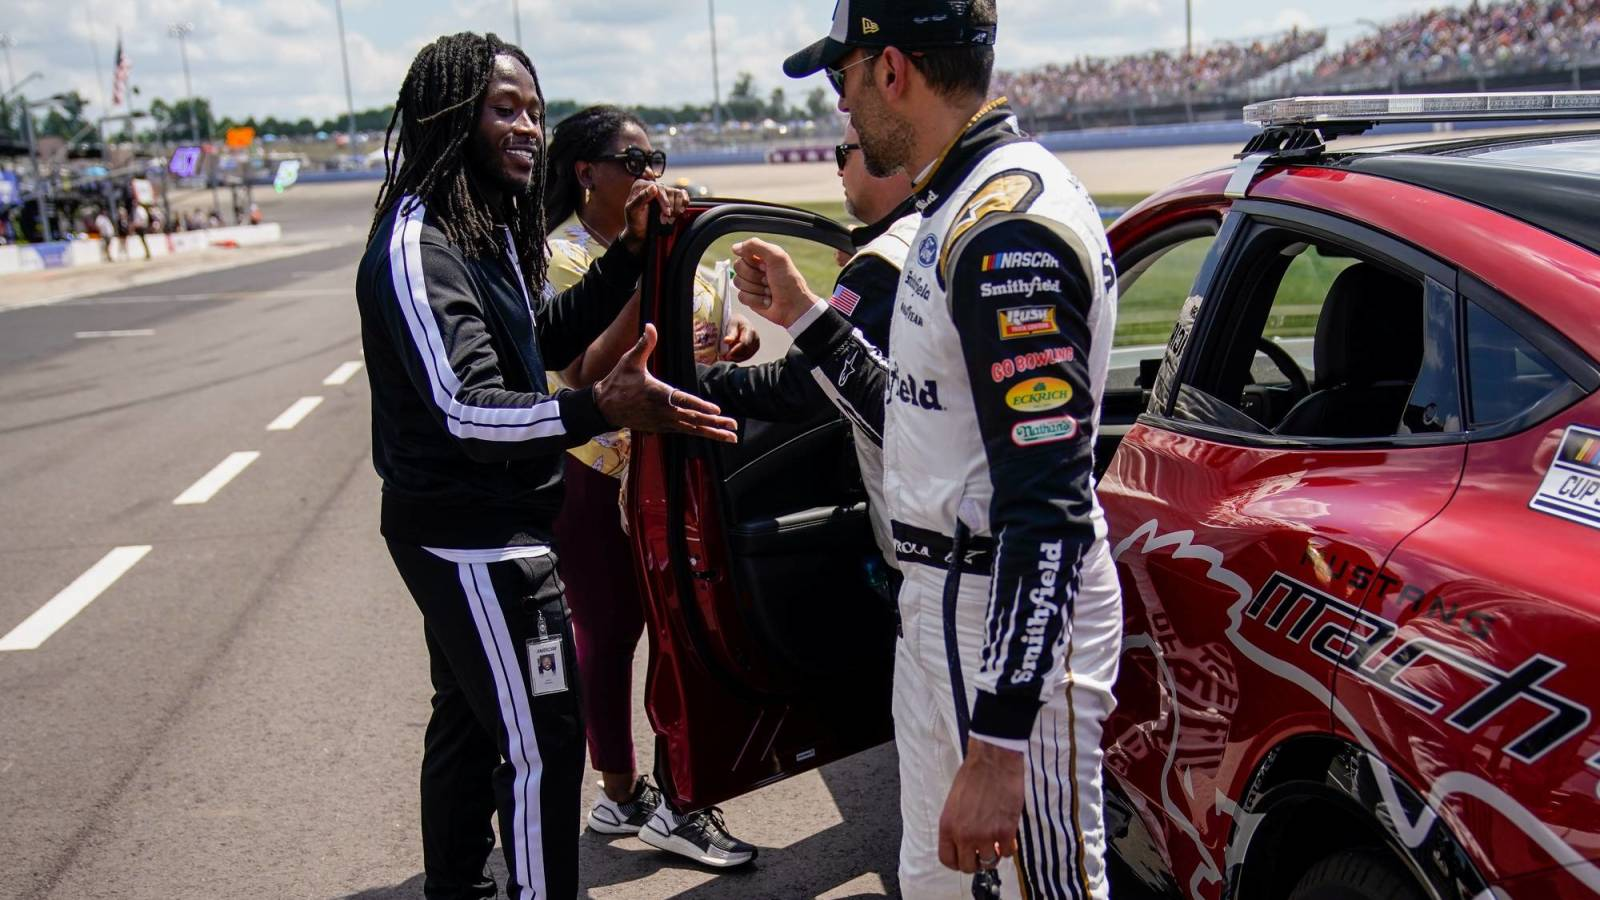 Saints RB Alvin Kamara has a new job with NASCAR